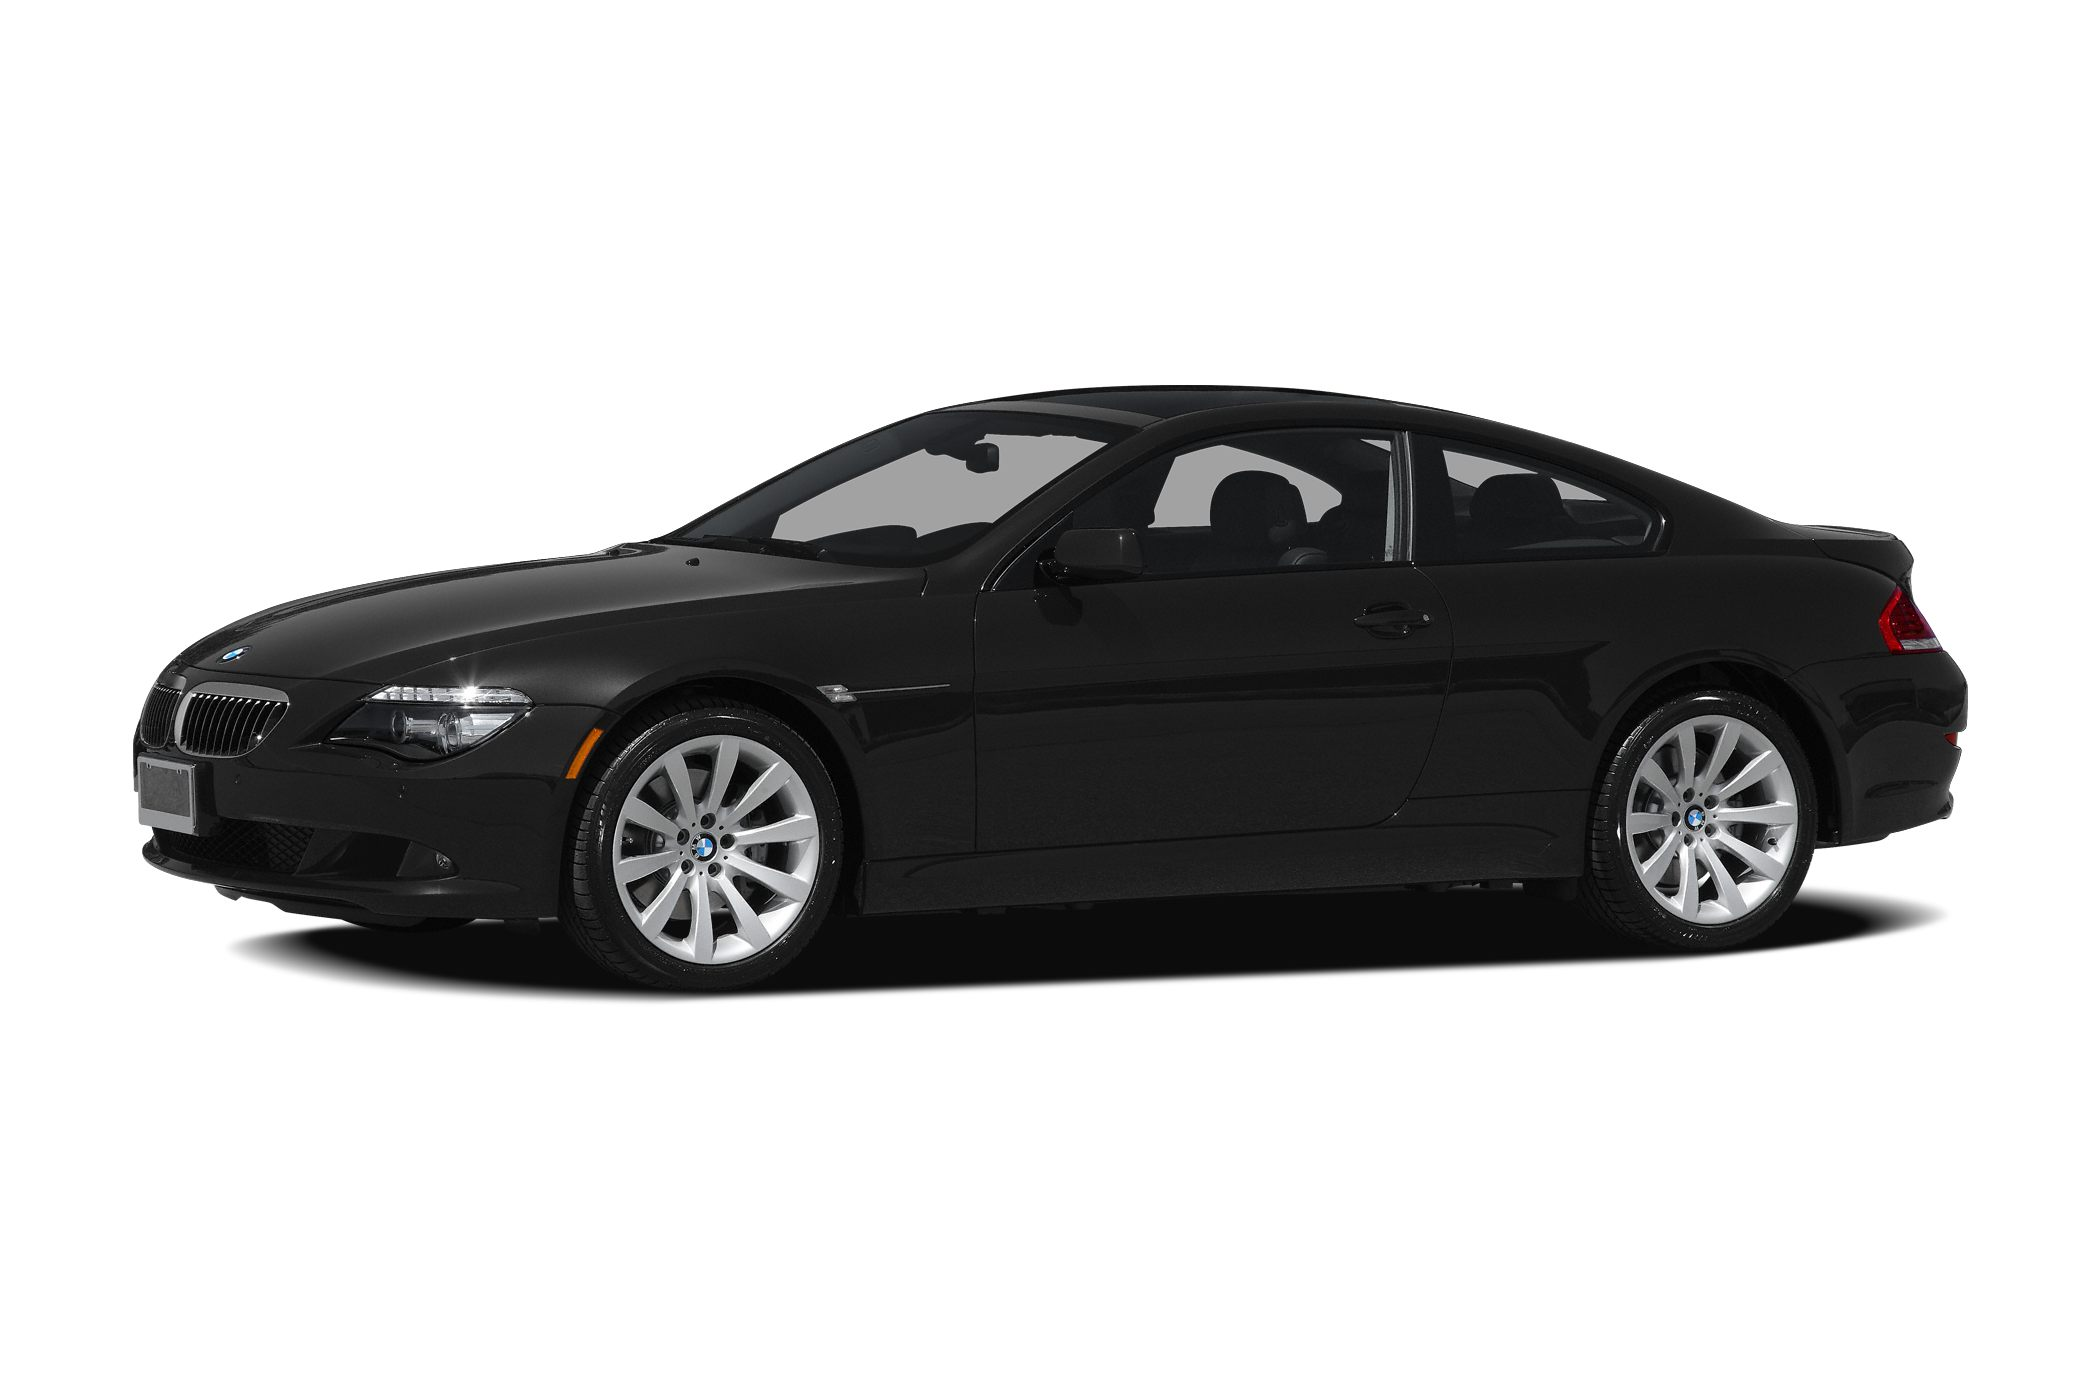 2010 BMW 650